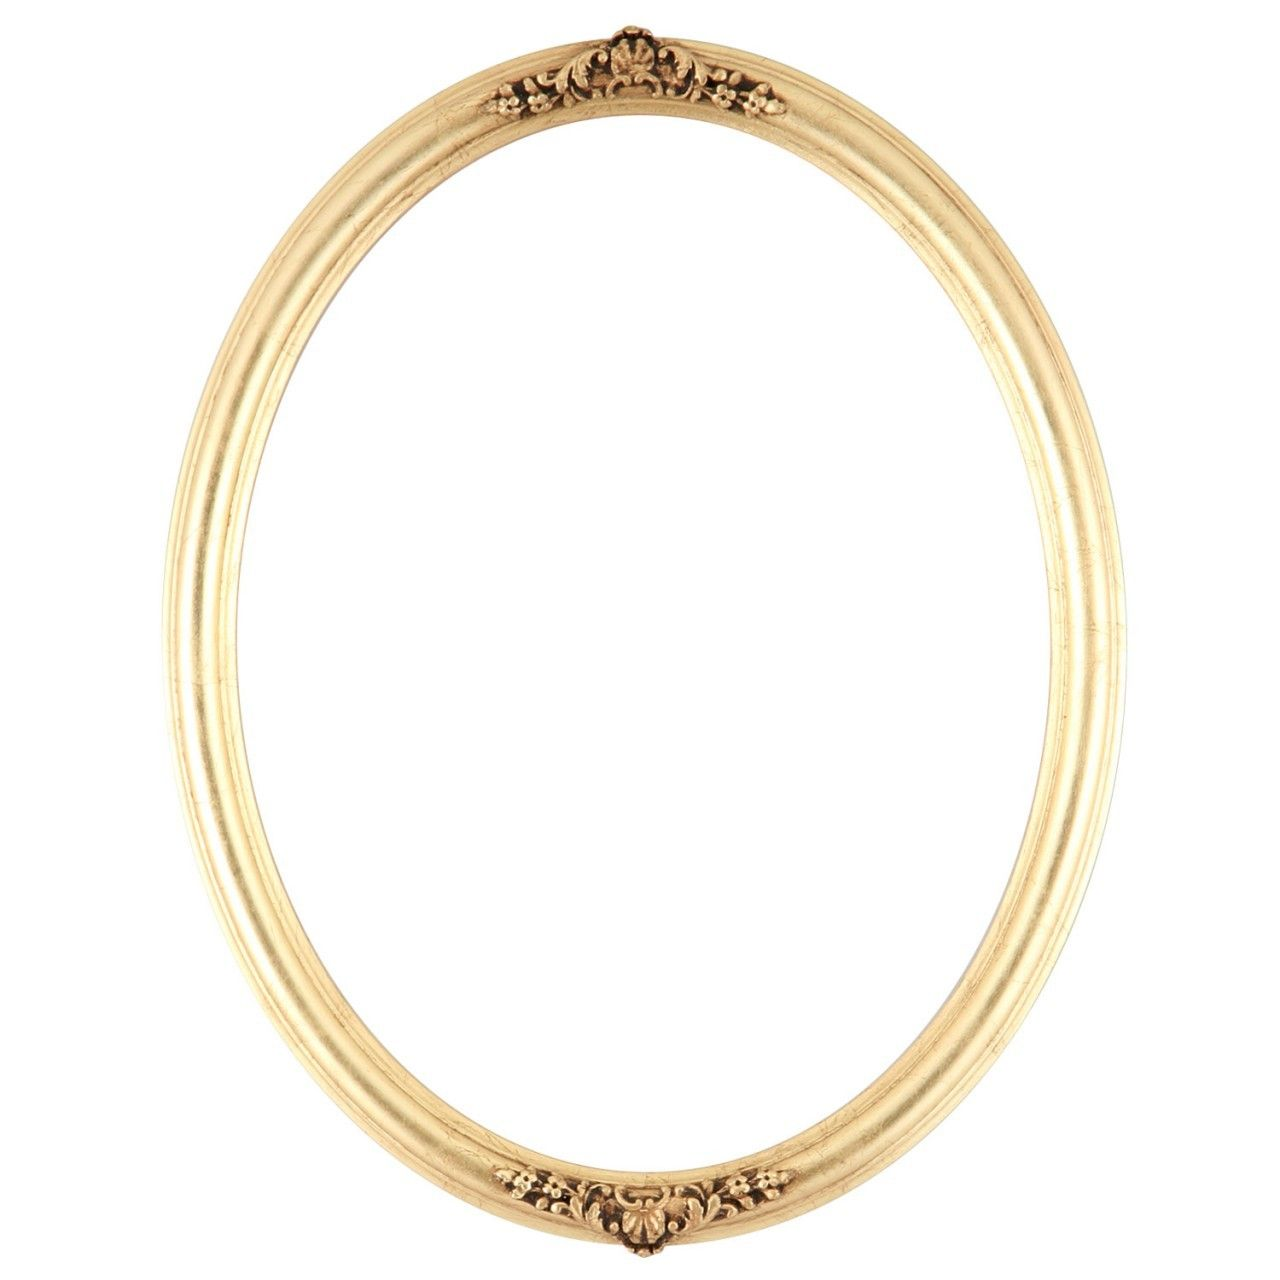 Golden Frames Png Pesquisa Google Oval Picture Frames Picture Frame Shop Picture Frame Decor